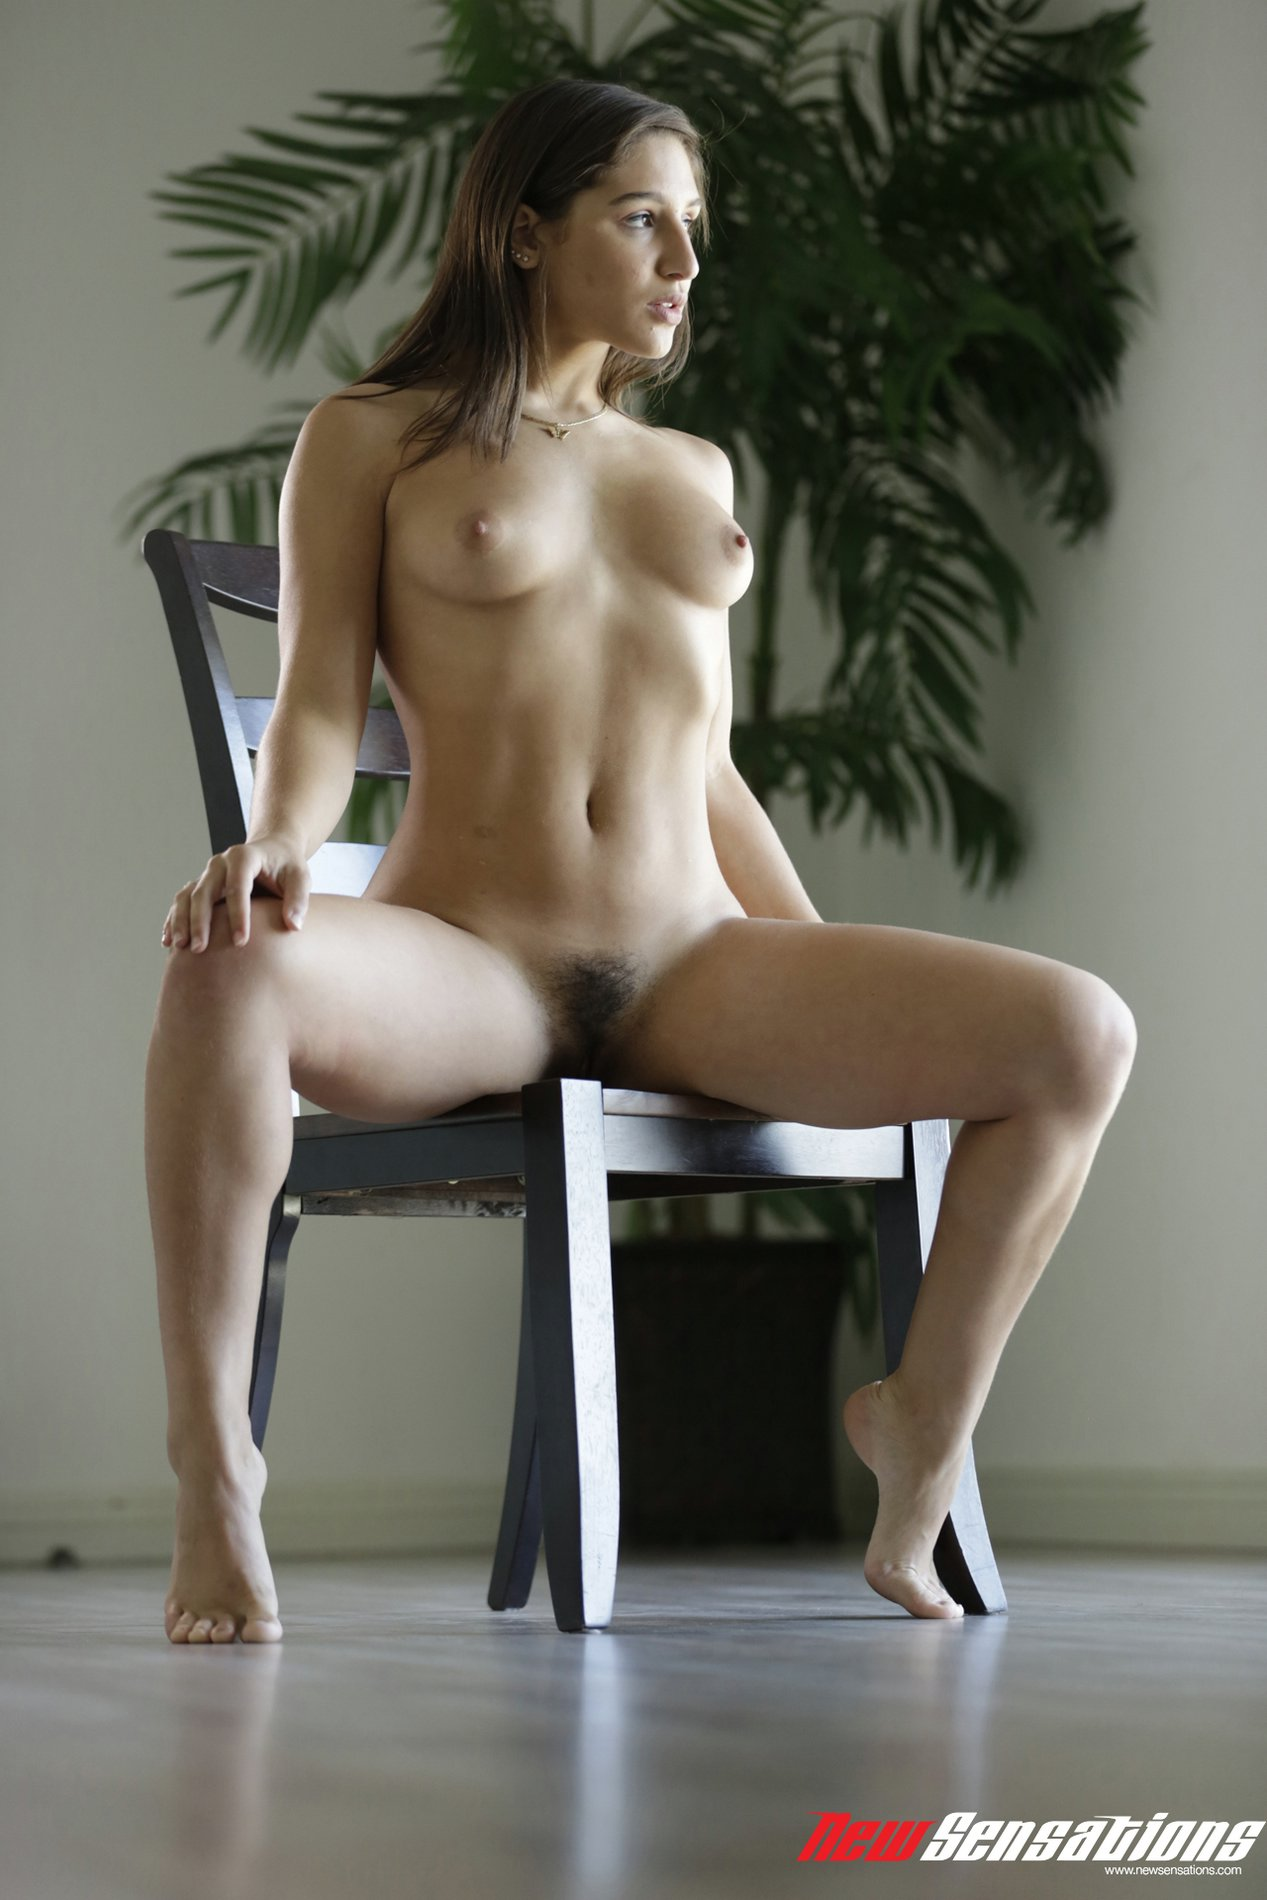 Hardcore anal sex video